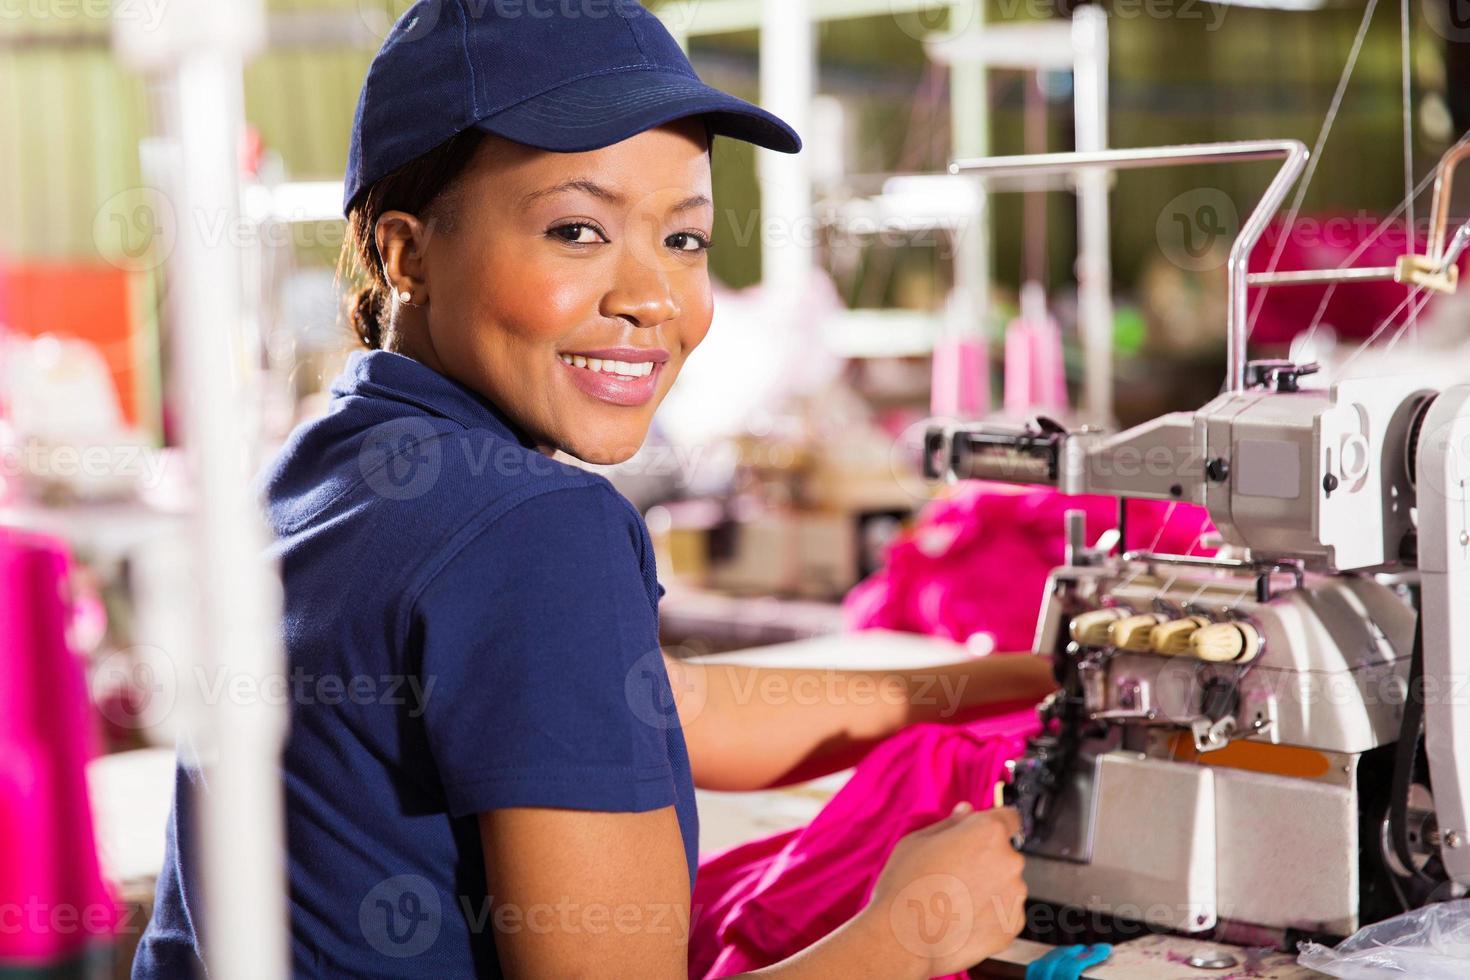 kvinnlig afrikansk klädfabriksarbetare foto